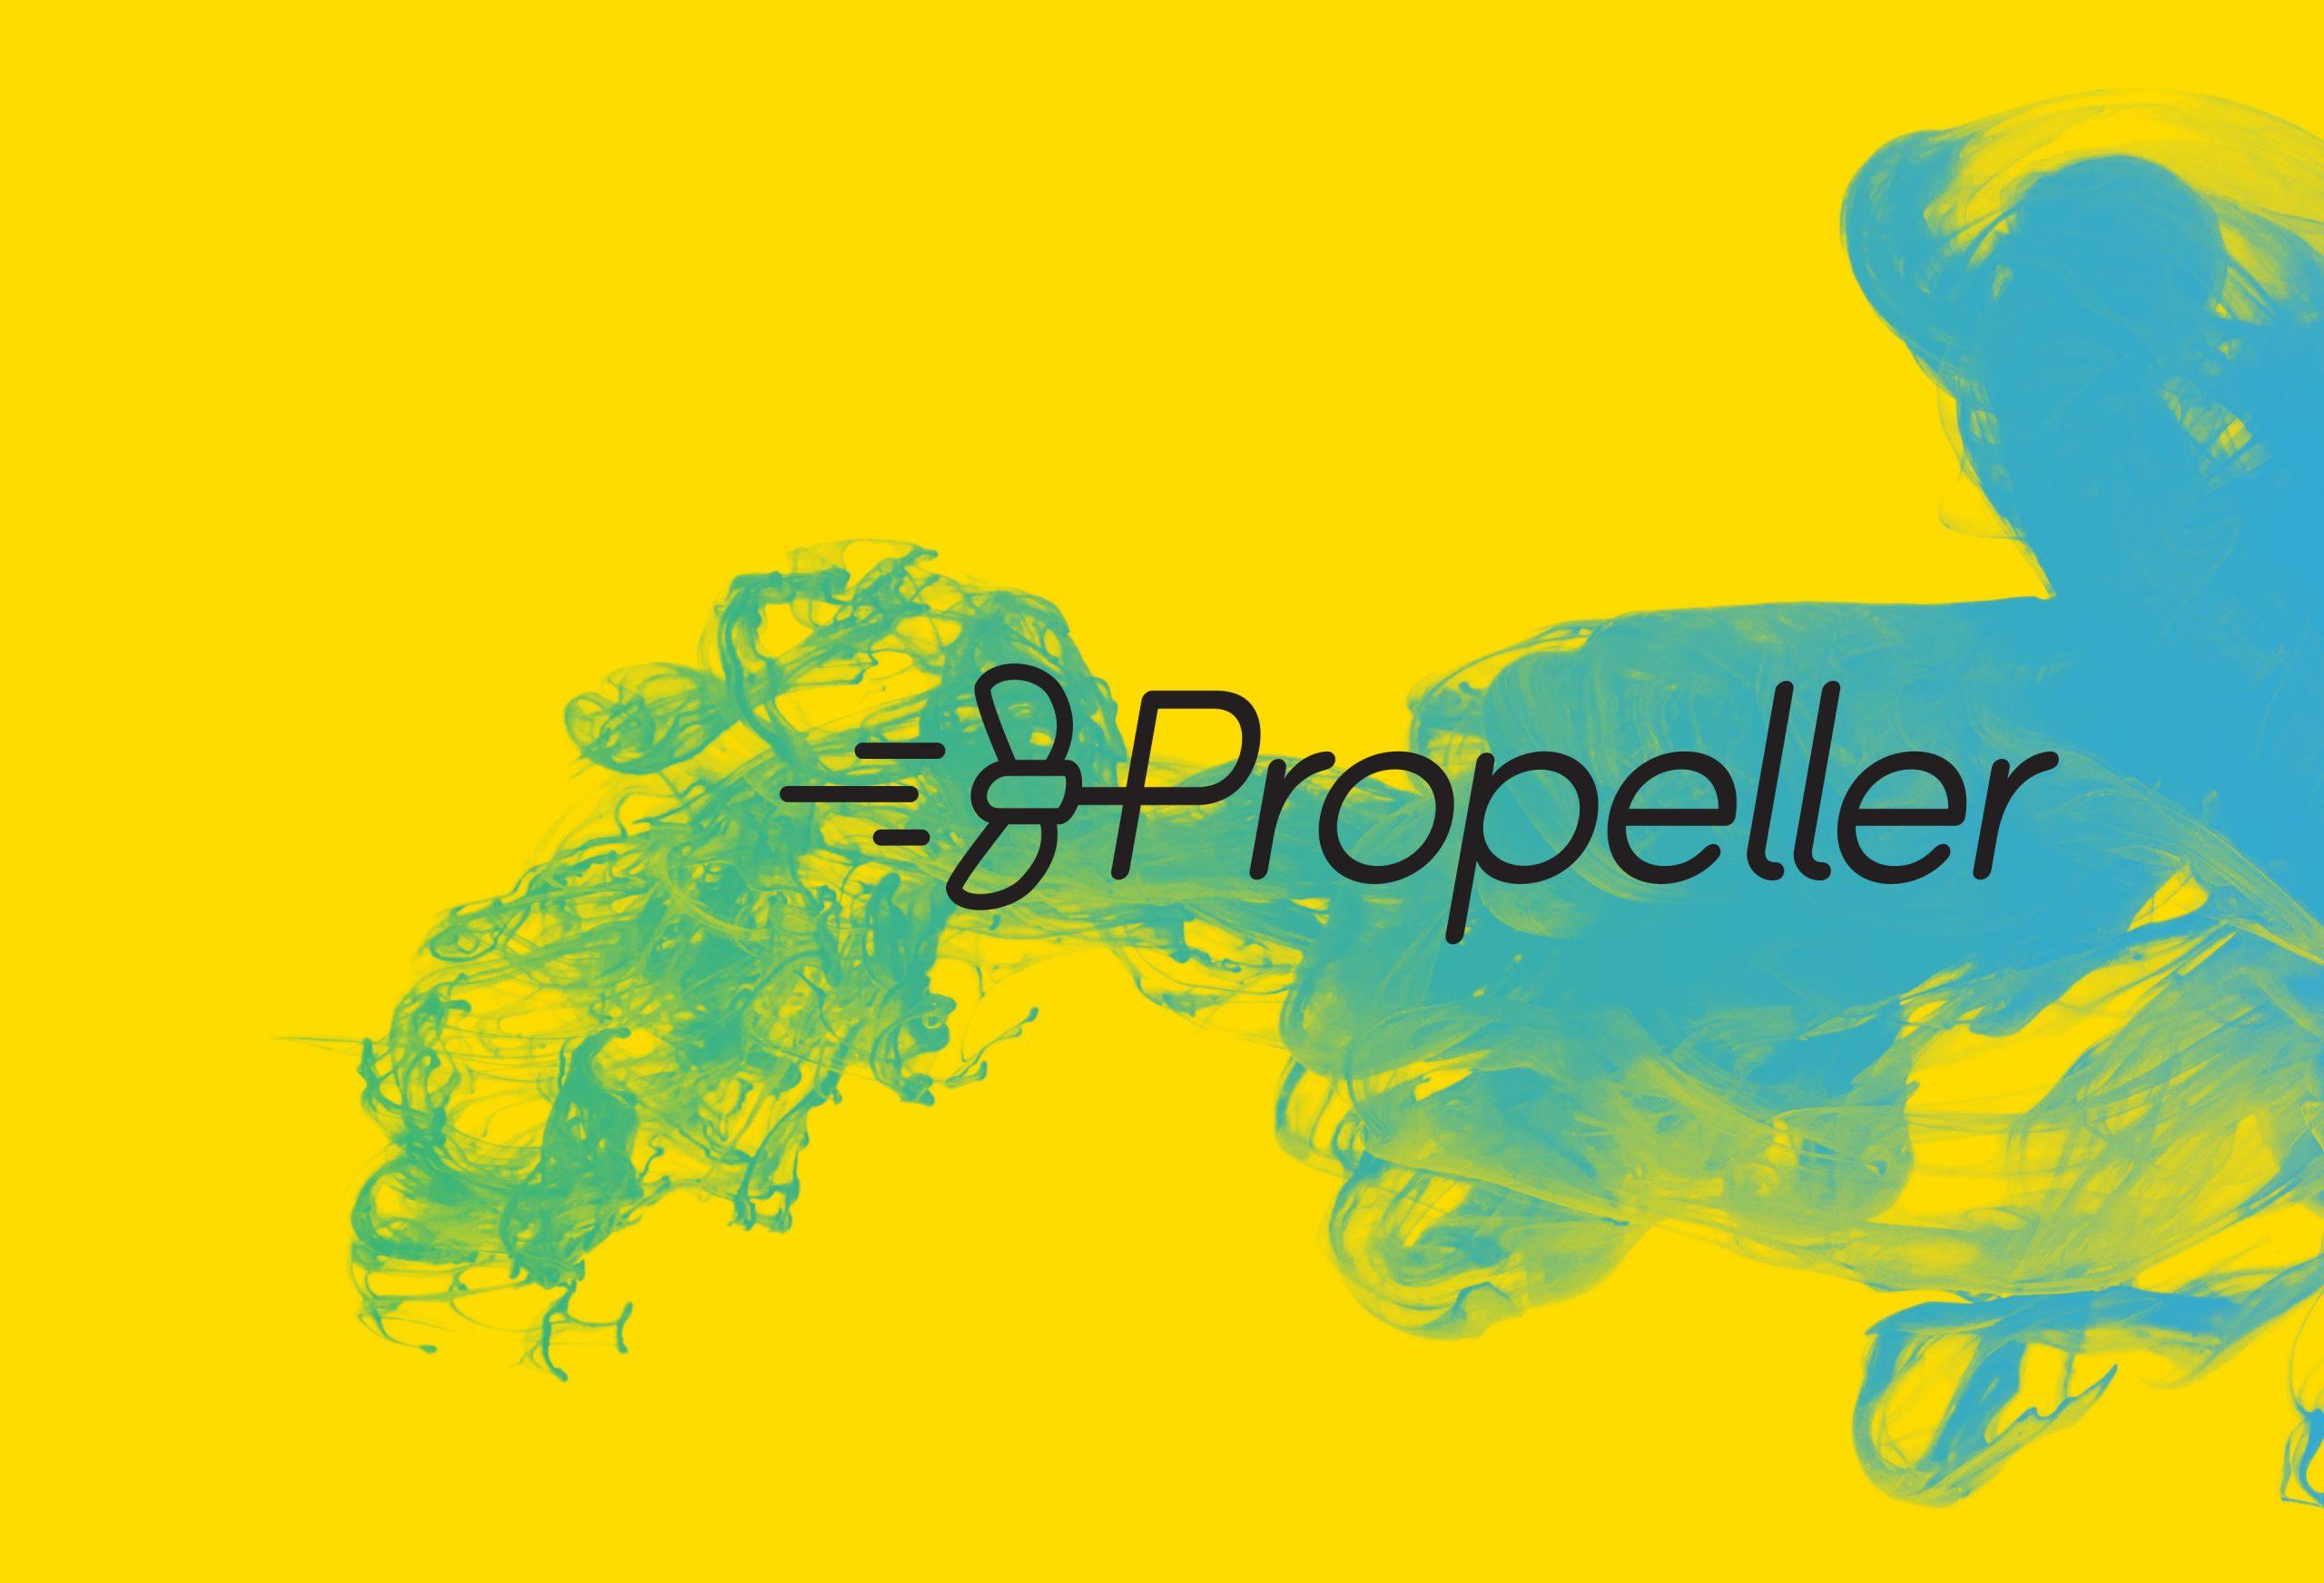 PropellerLogo01